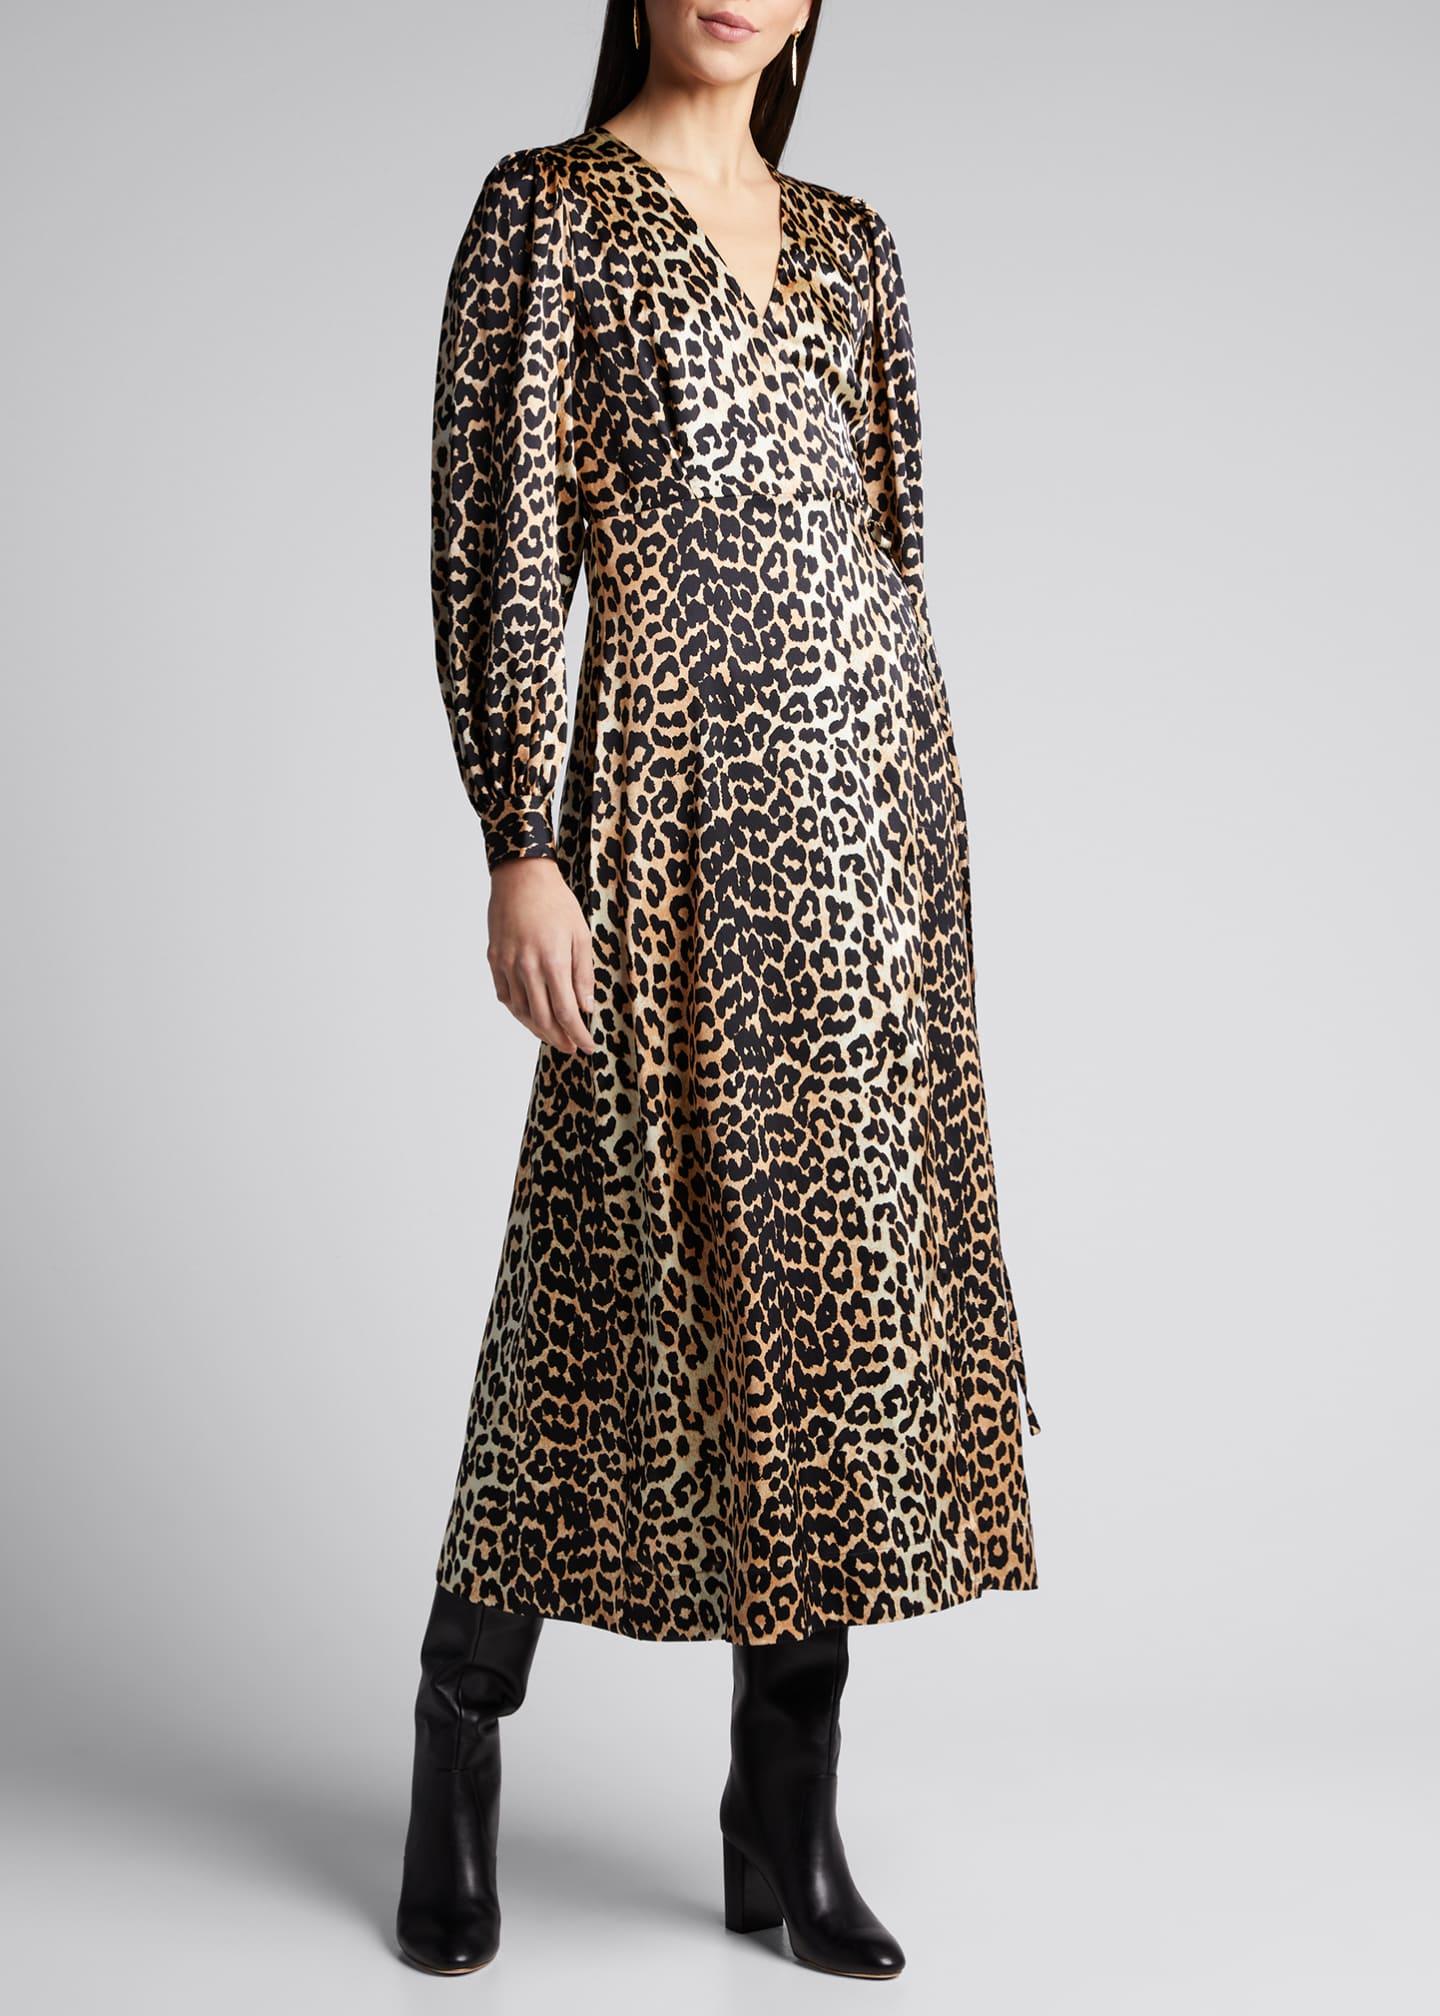 Ganni Stretch Satin Leopard-Print Wrap Dress